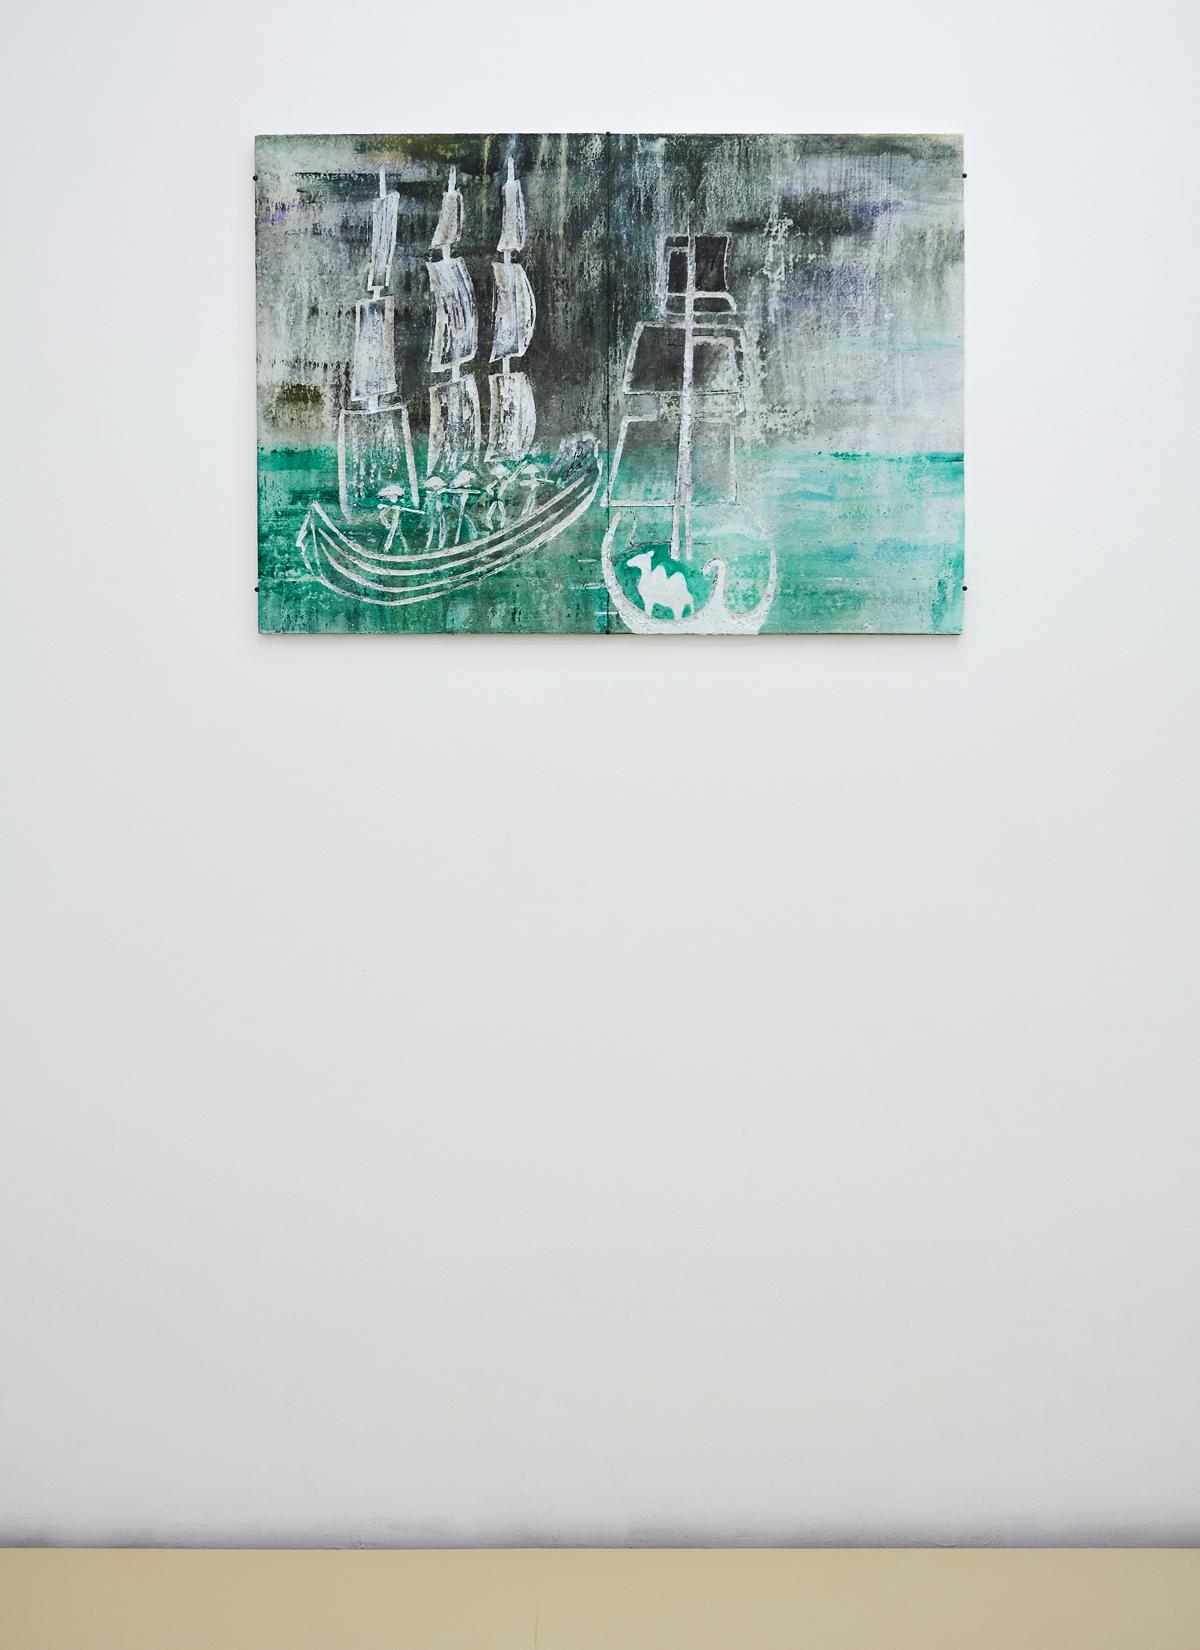 Lin May Saeed, Djamil Relief, 2017. Styrofoam, acrylic paint, cardboard, 56 x 80 x 5 cm